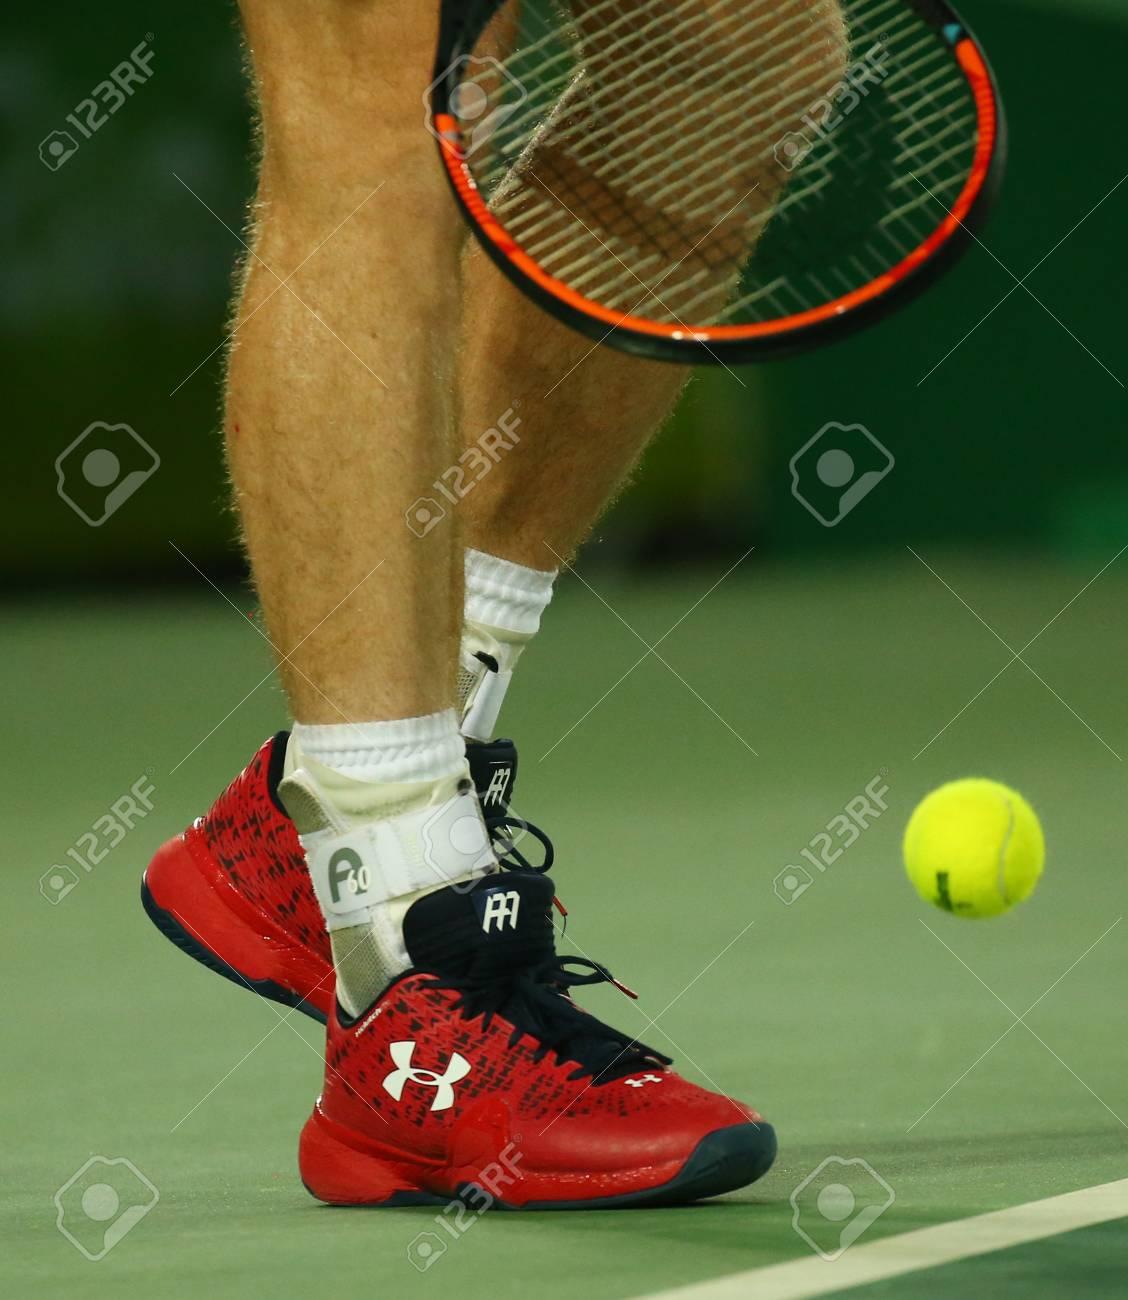 Personnalisé Chaussures Tennis Bretagne Août Olympique 14 Lors Rio De 2016Champion Porte JaneiroBrésil Murray Grande Andy Under Armour gY6ybf7v